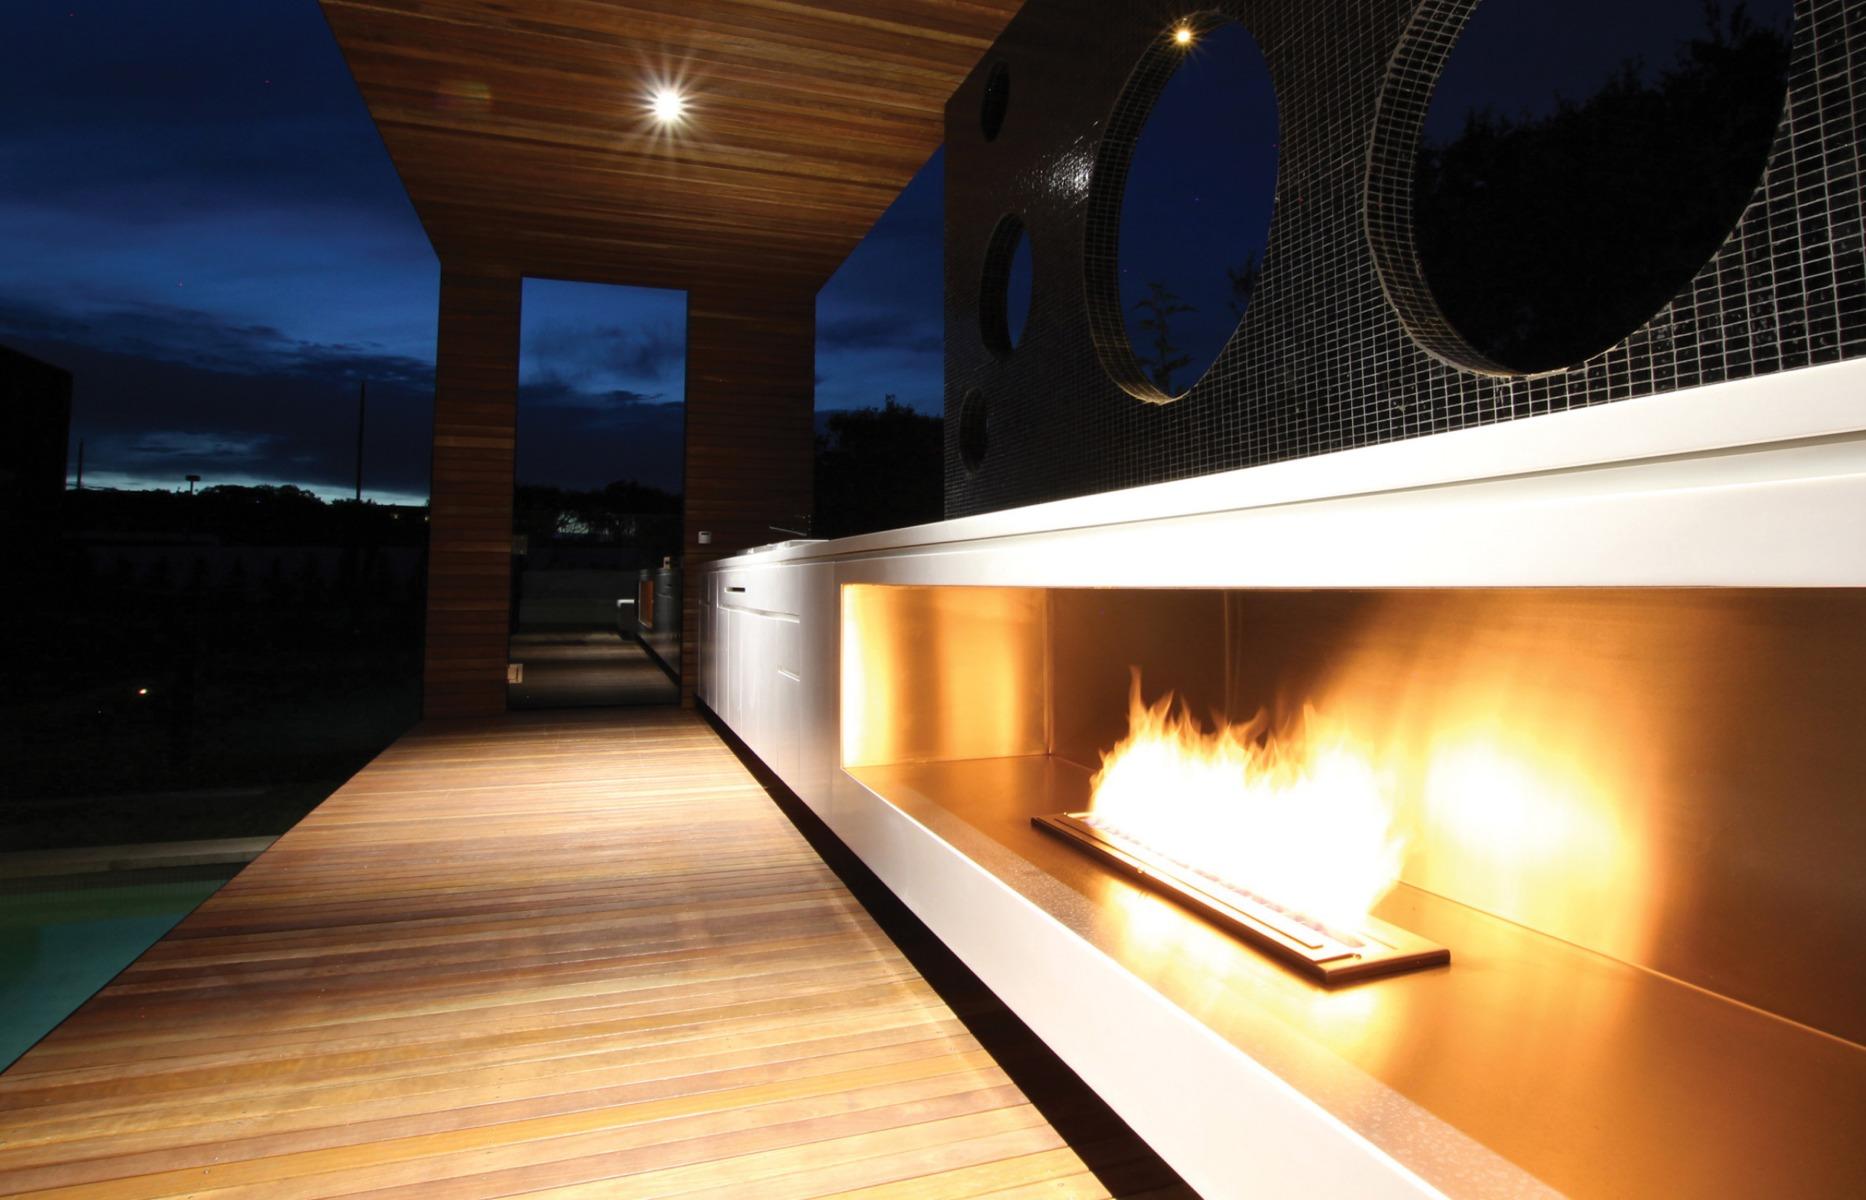 EcoSmart Fire XL900 ethanol burner Portsea